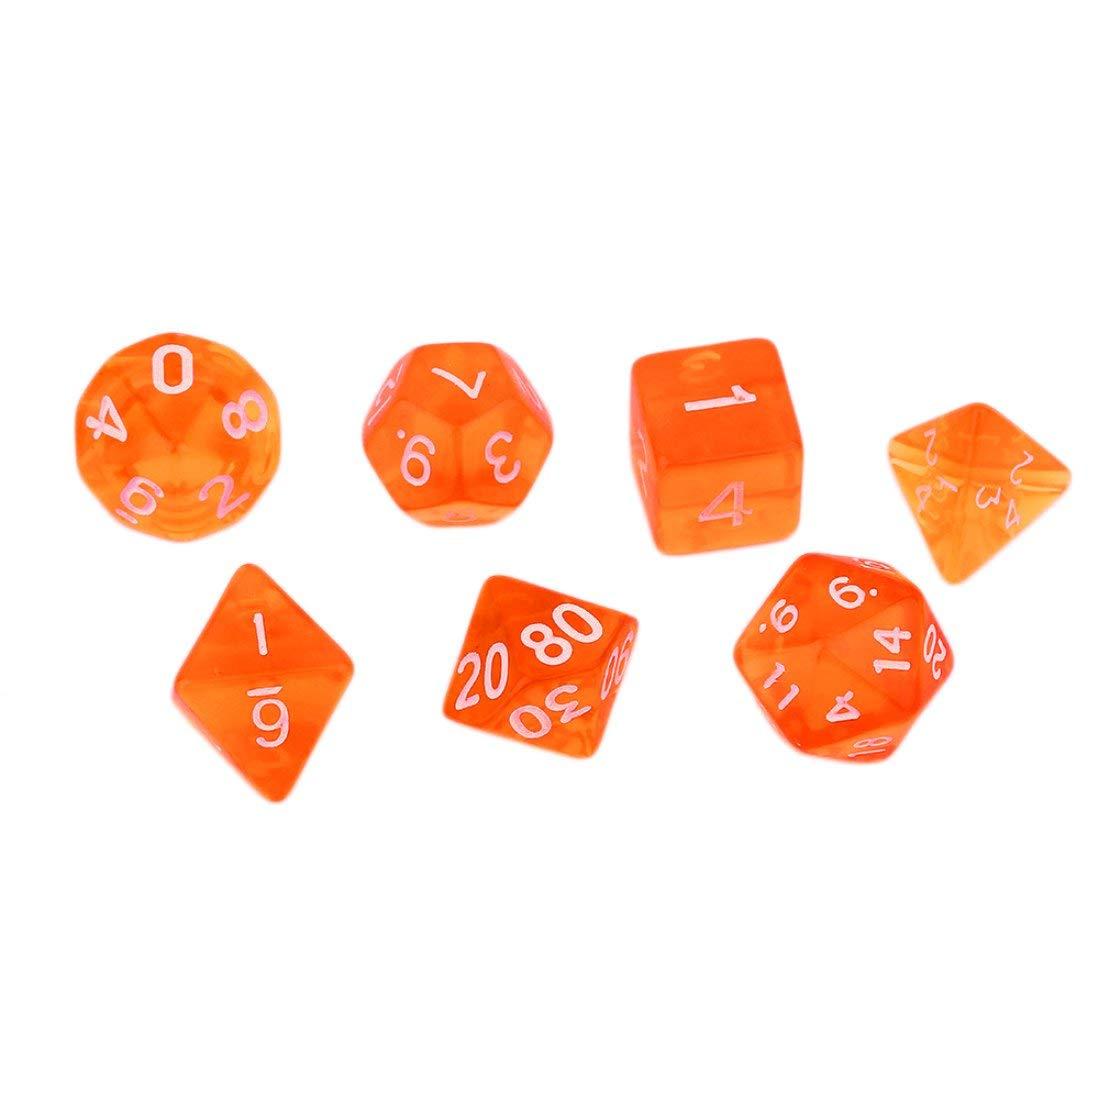 Sanzhileg Transparente helle Farbe 7 Stück Set kreative facettenreiche Dice16-20mm D4 D6 D8 D10 D12 D20 Spiel würfelt - Orange